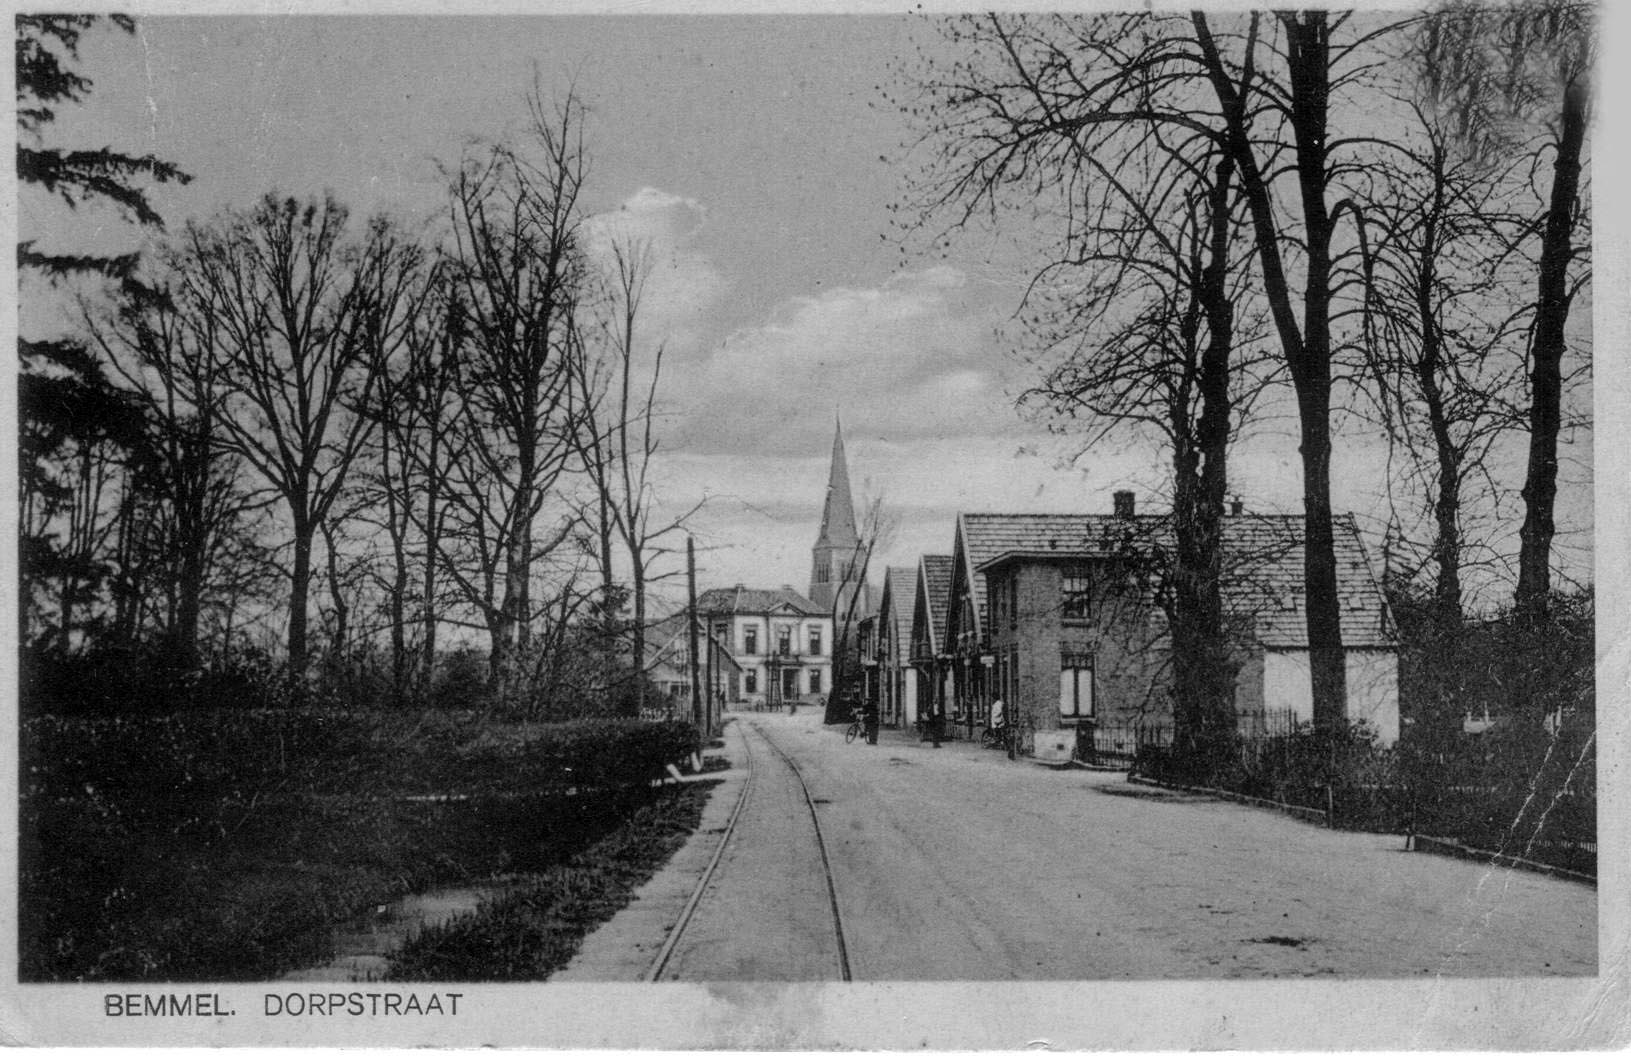 Dorpstraat-1934